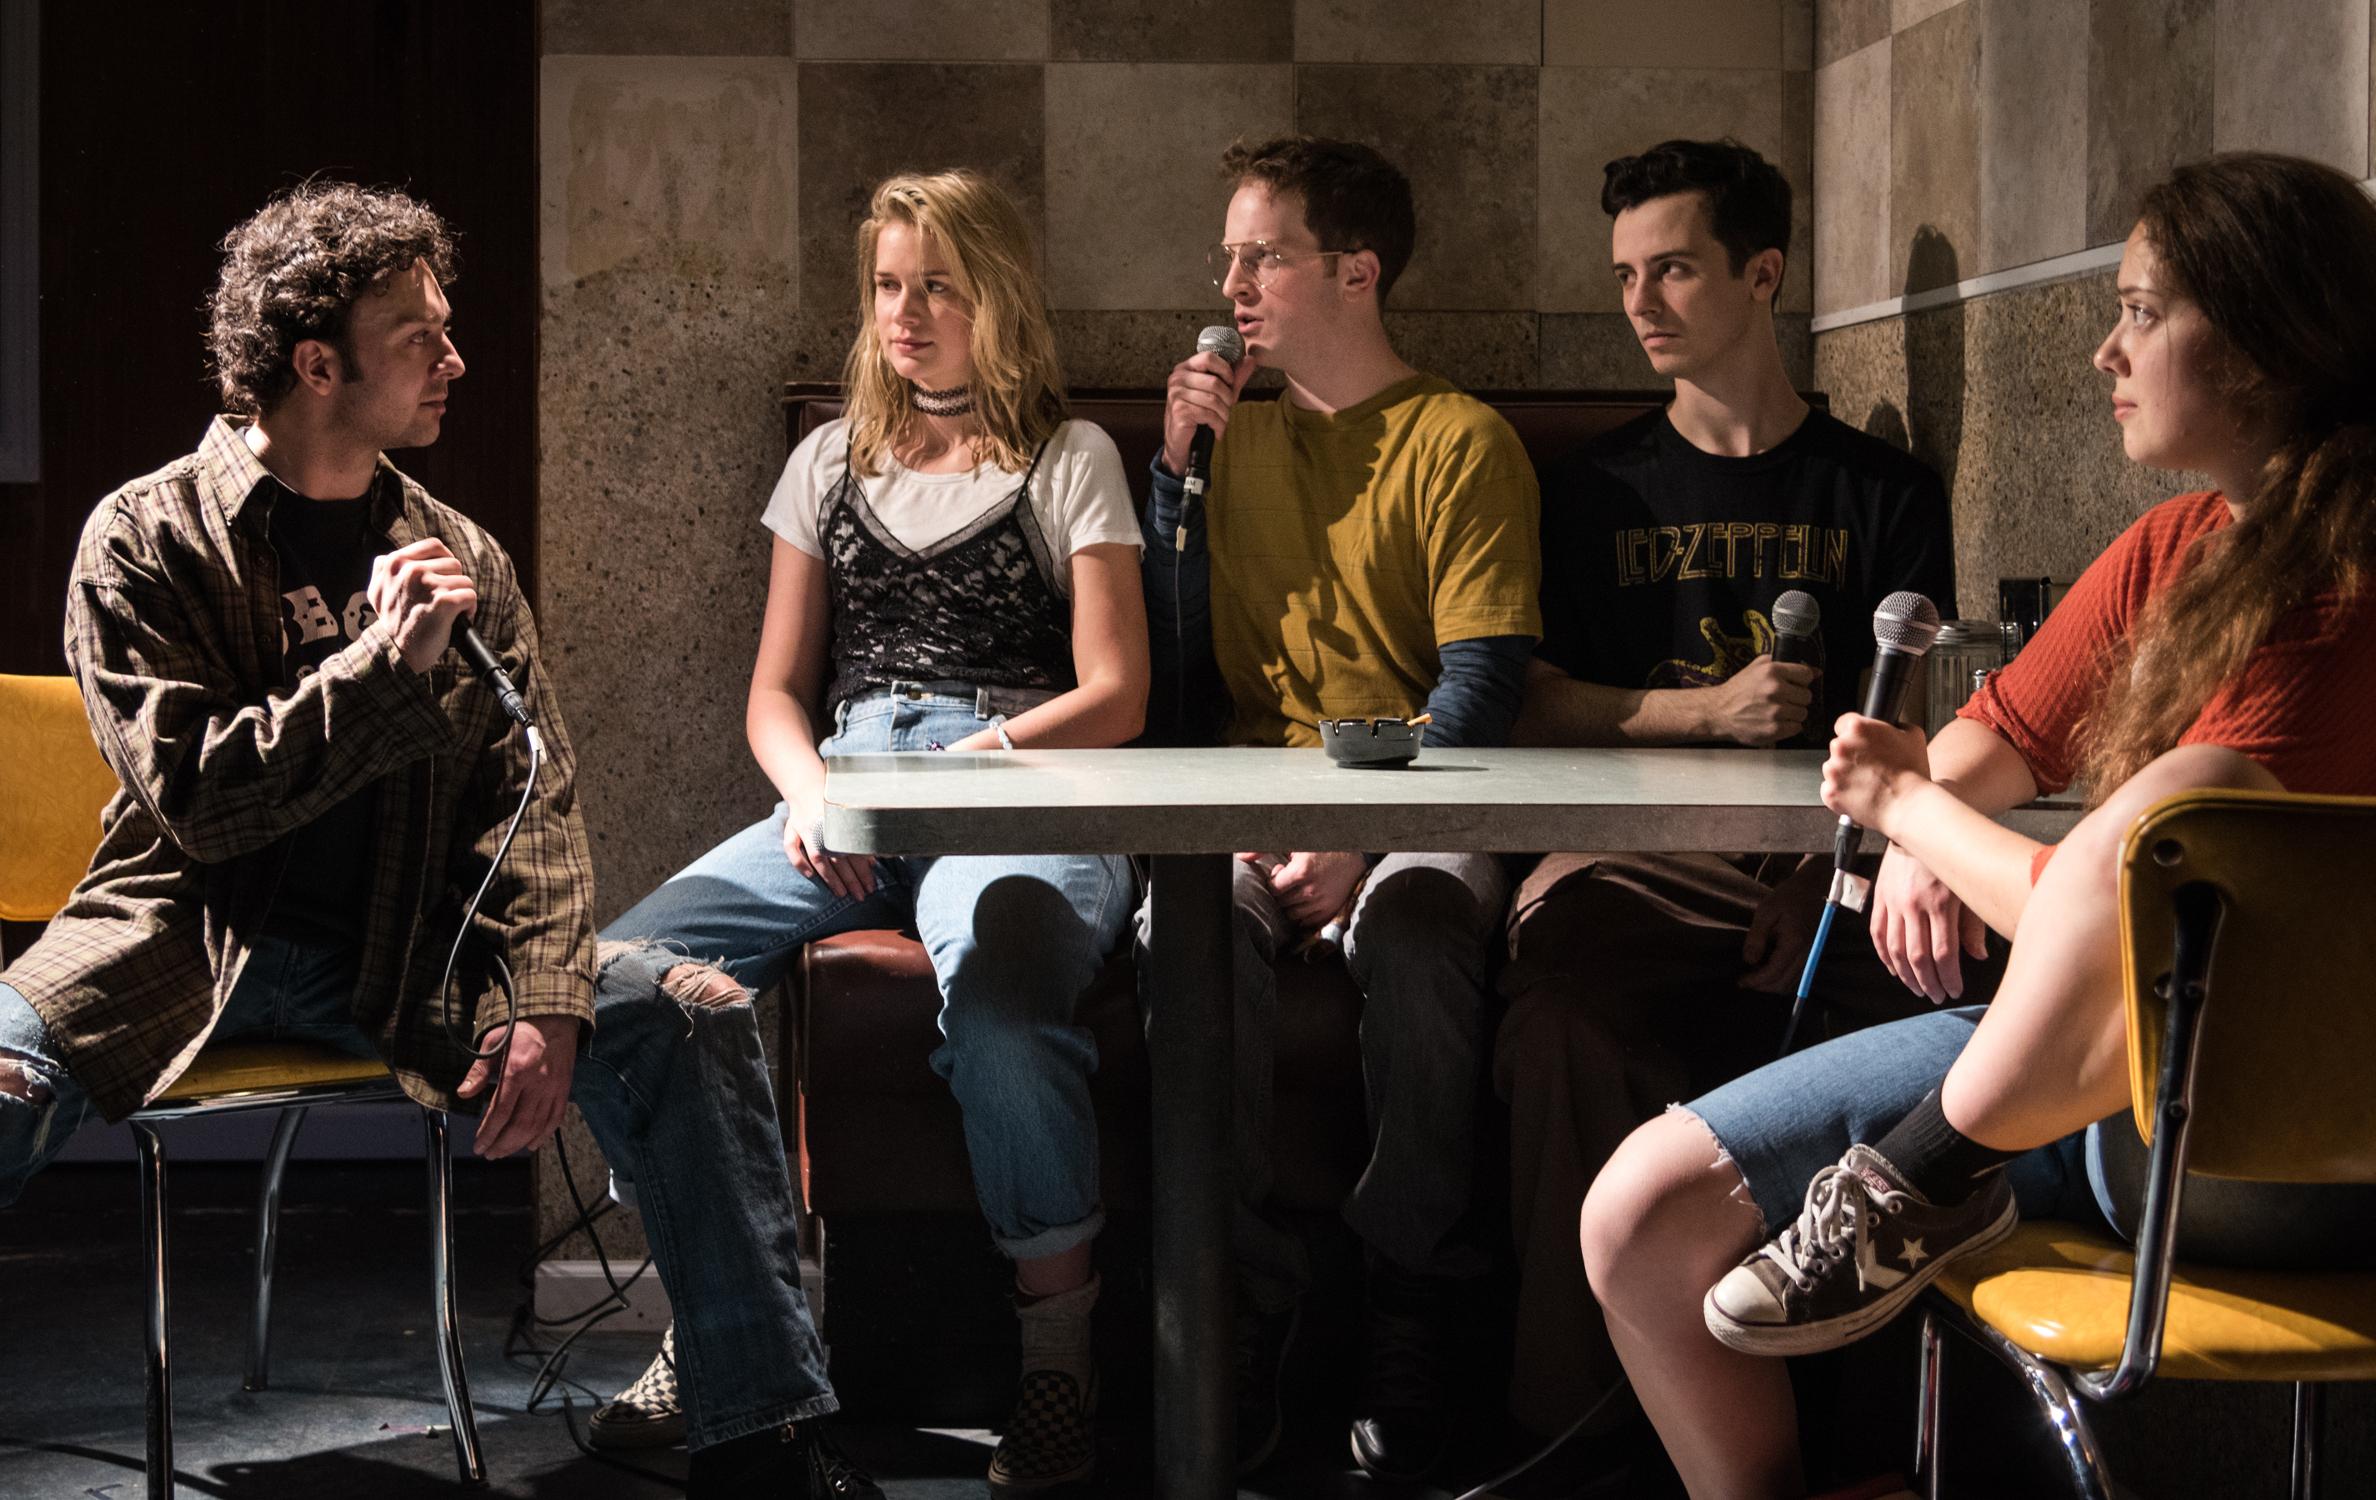 James Kautz as Adam, Elizabeth Lail as Hayley, Spencer Davis Milford as Matt, Sean Patrick Monahan as Pete, Rachel Franco as Tara.Photo credit: Russ Rowland.